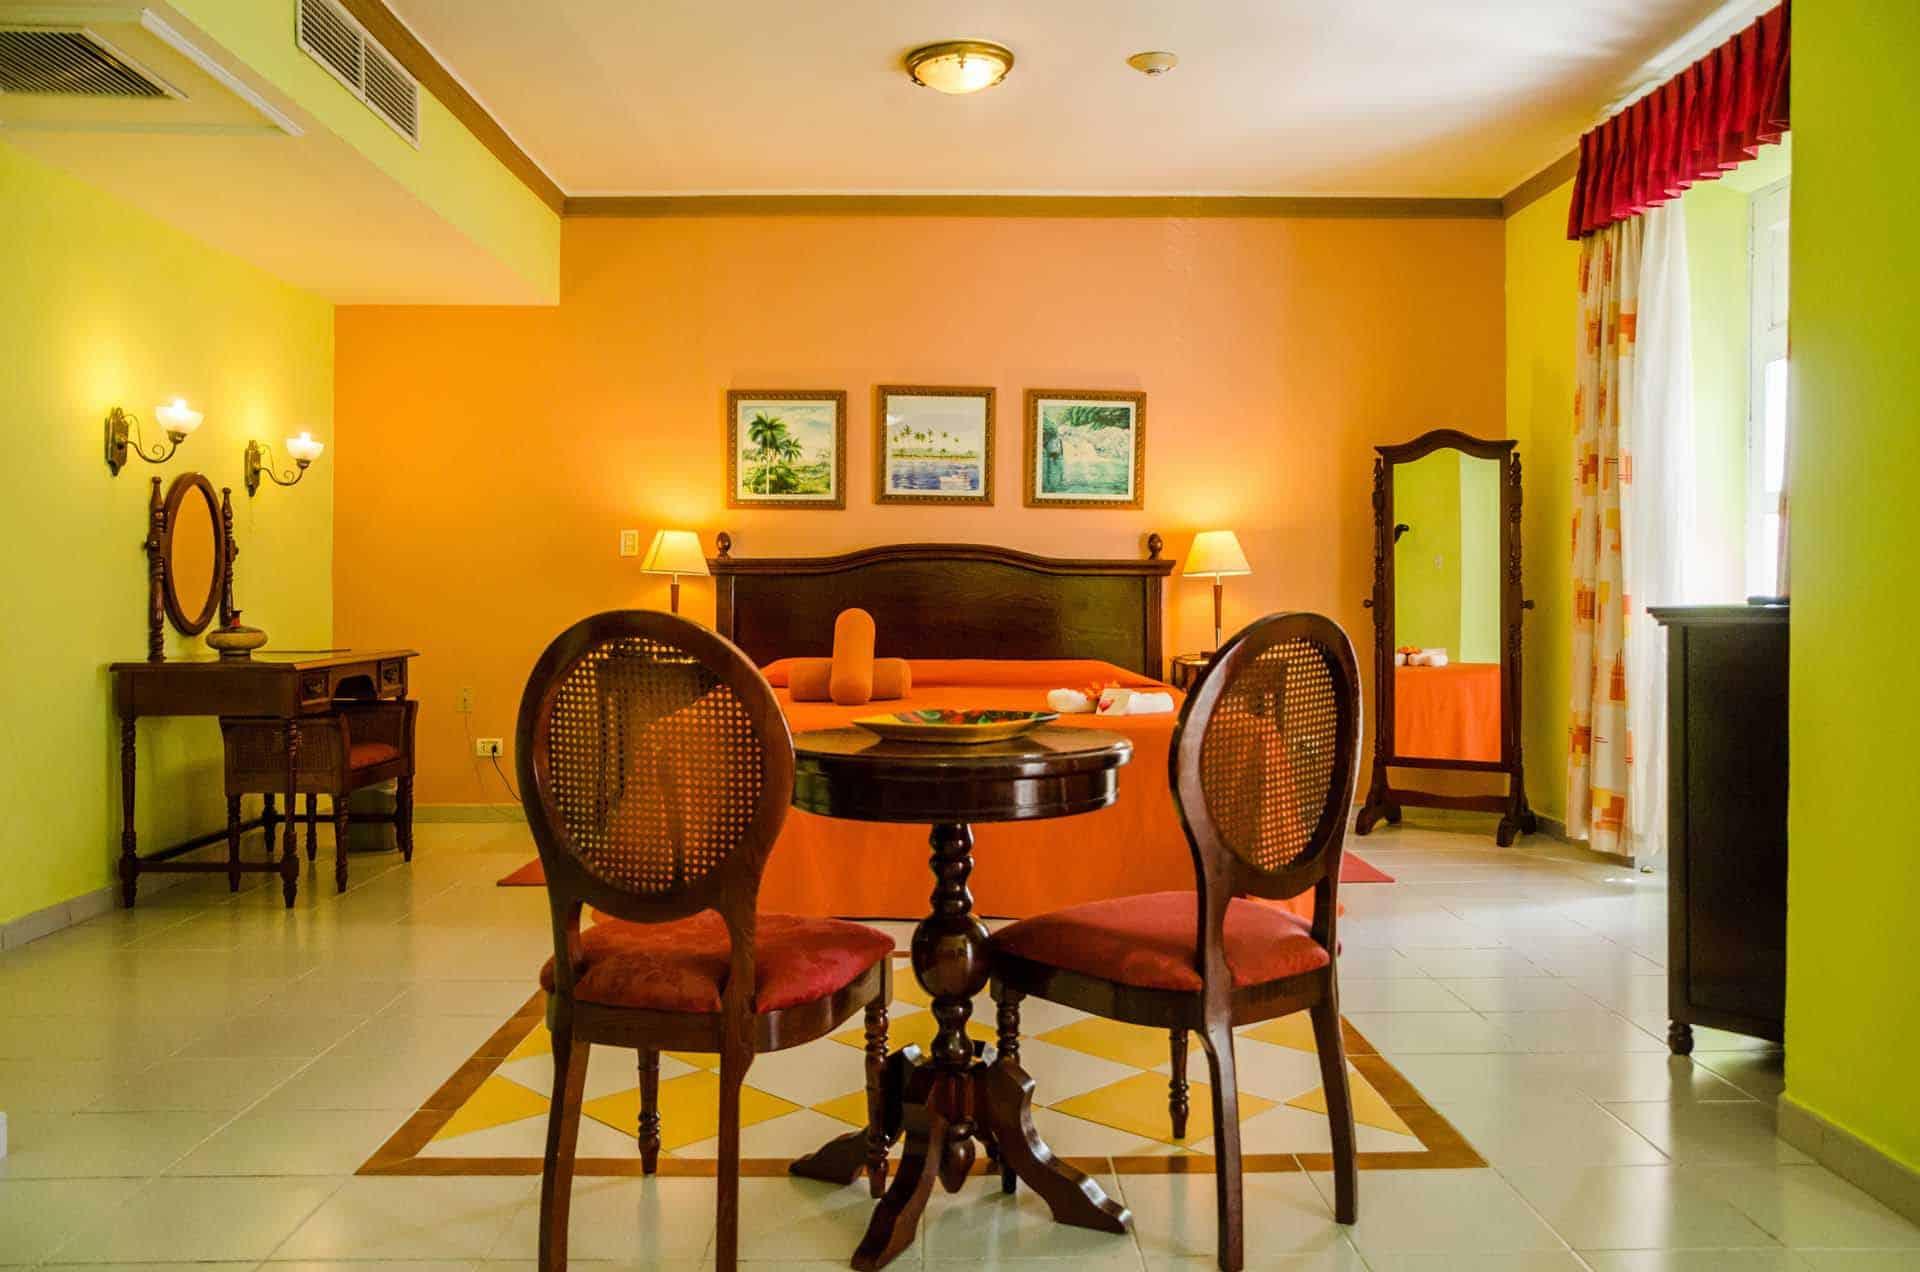 H1146 Hotel La Union Cienfuegos 07 cuba autrement